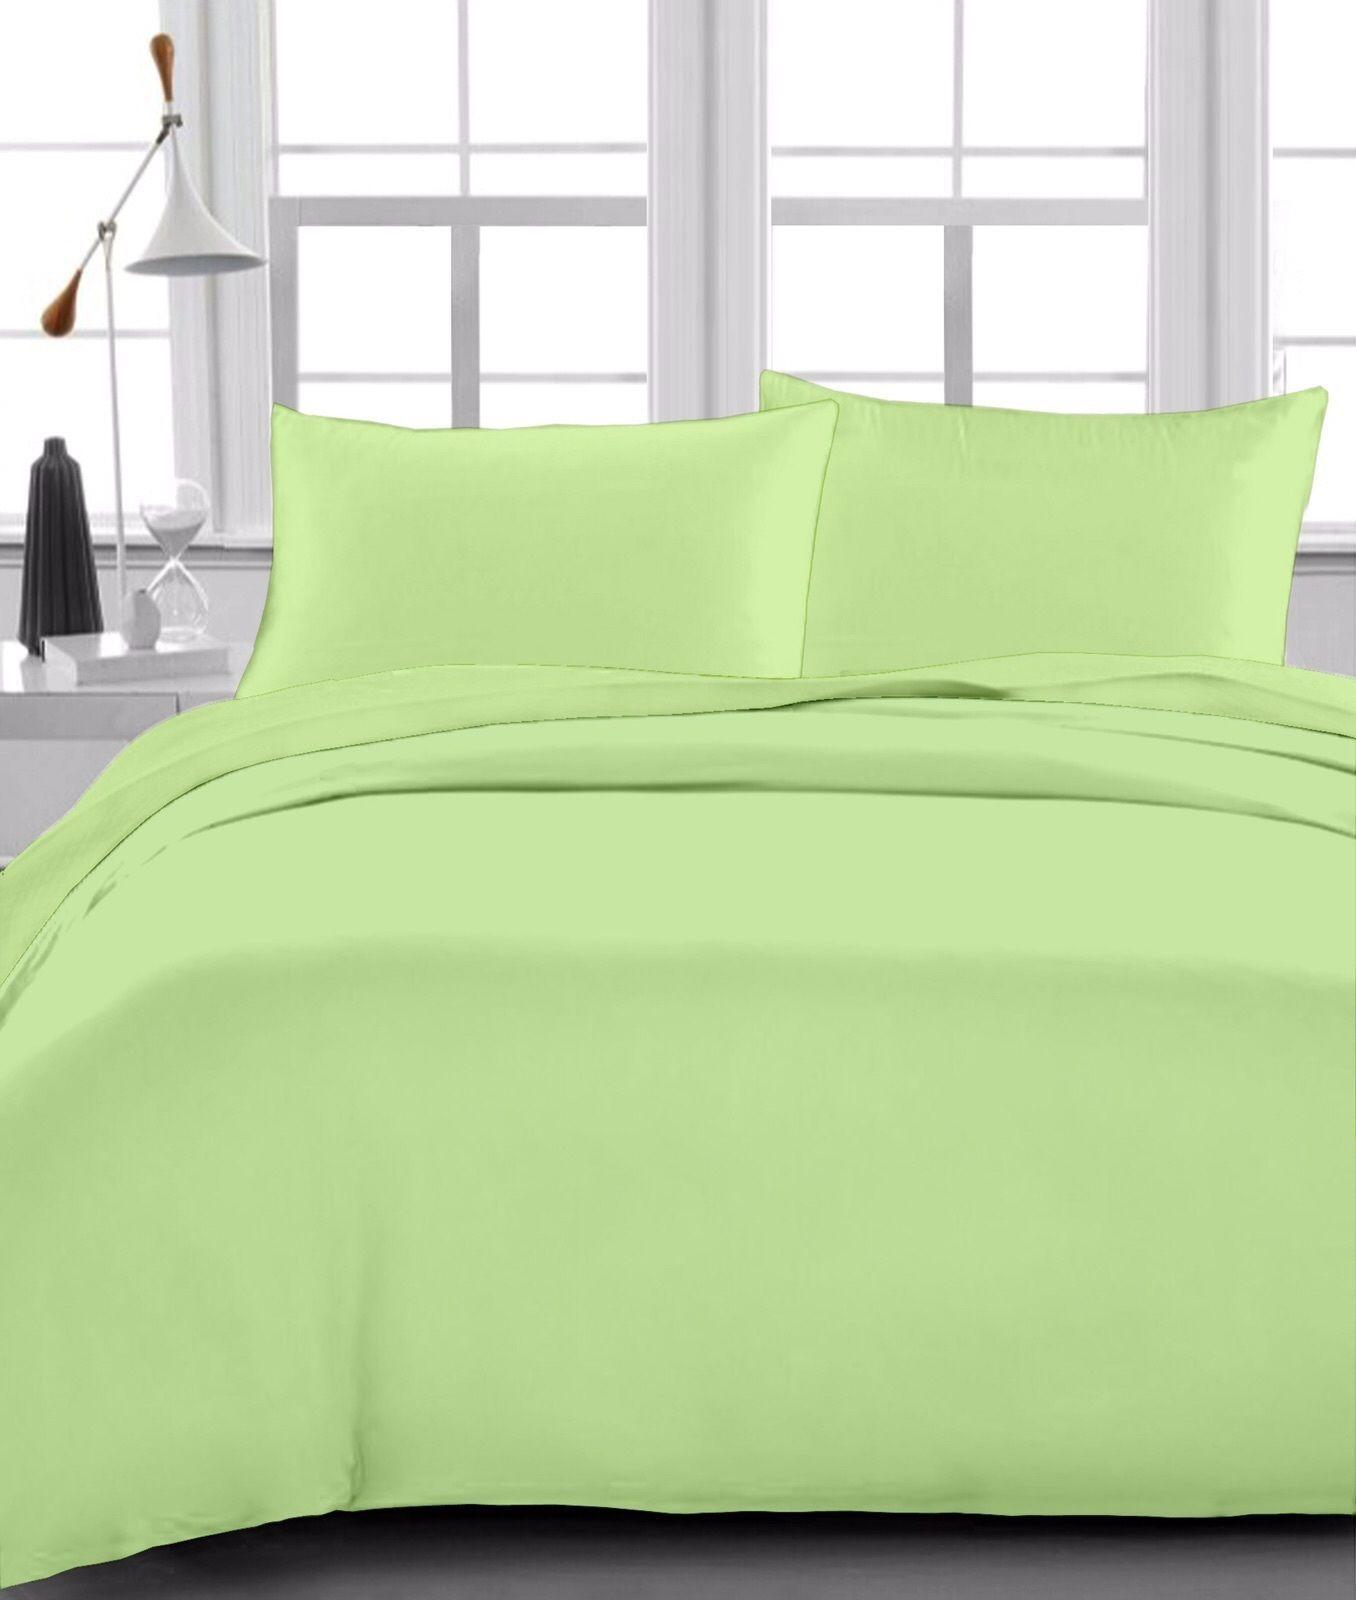 Stylish 1 Qty Flat Sheet Organic Cotton 1000 Thread Count Sage Solid